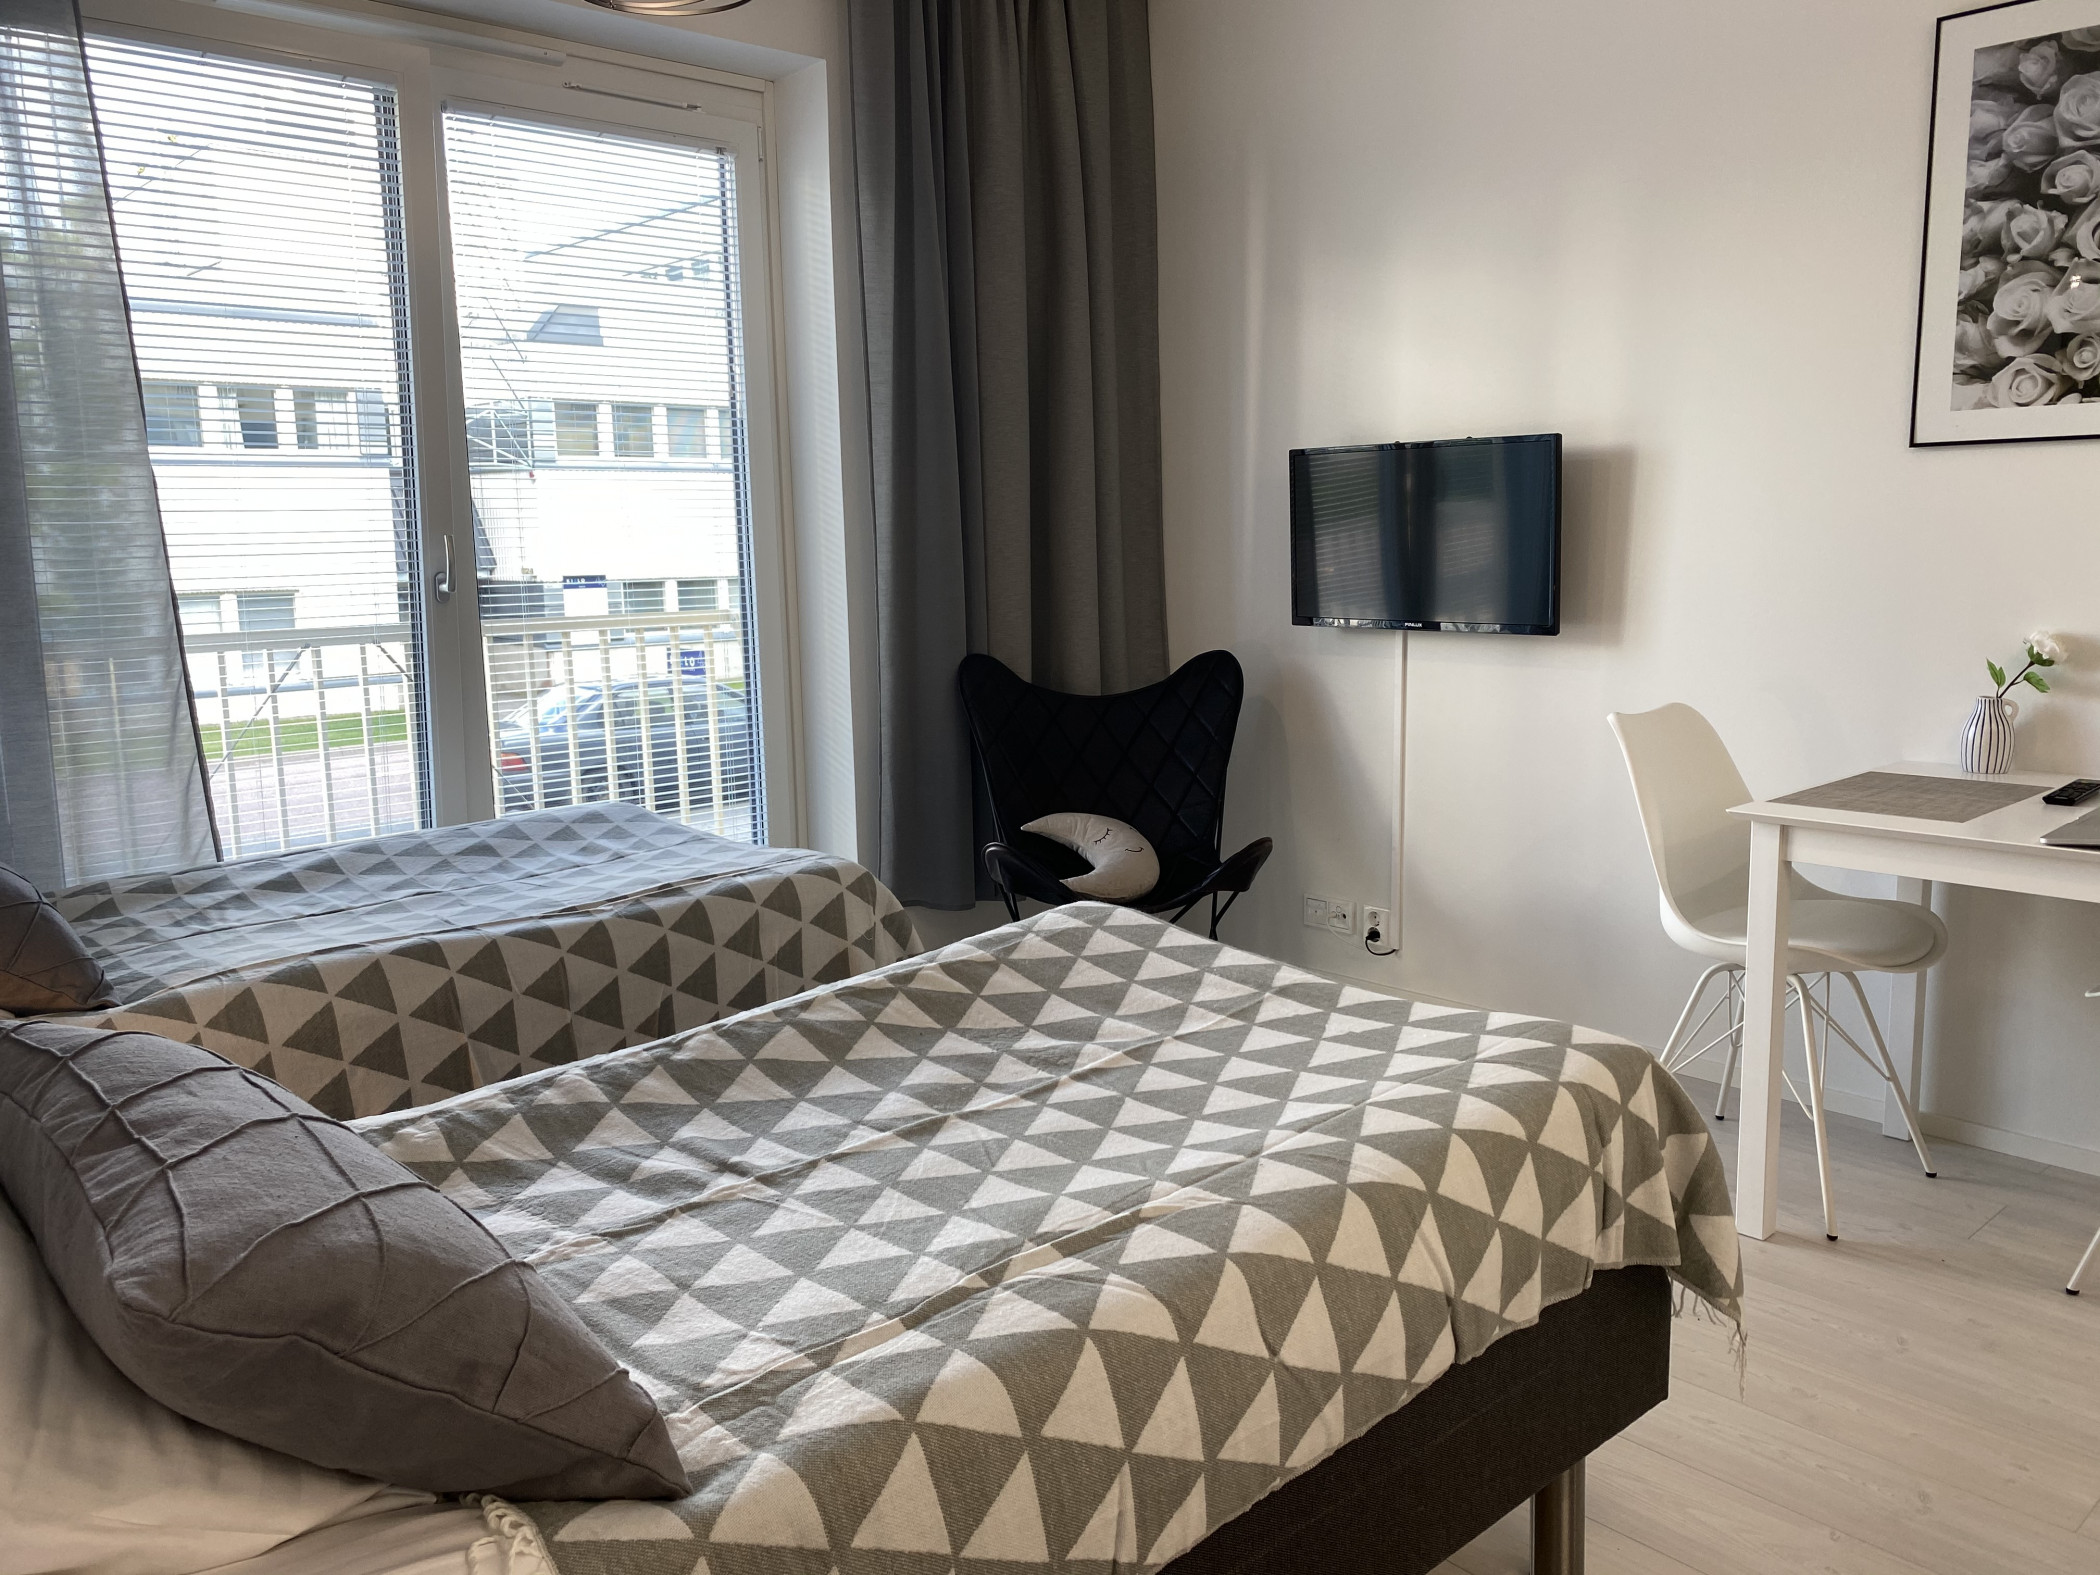 Time Apartments Ylistönmäentie 33 A 1